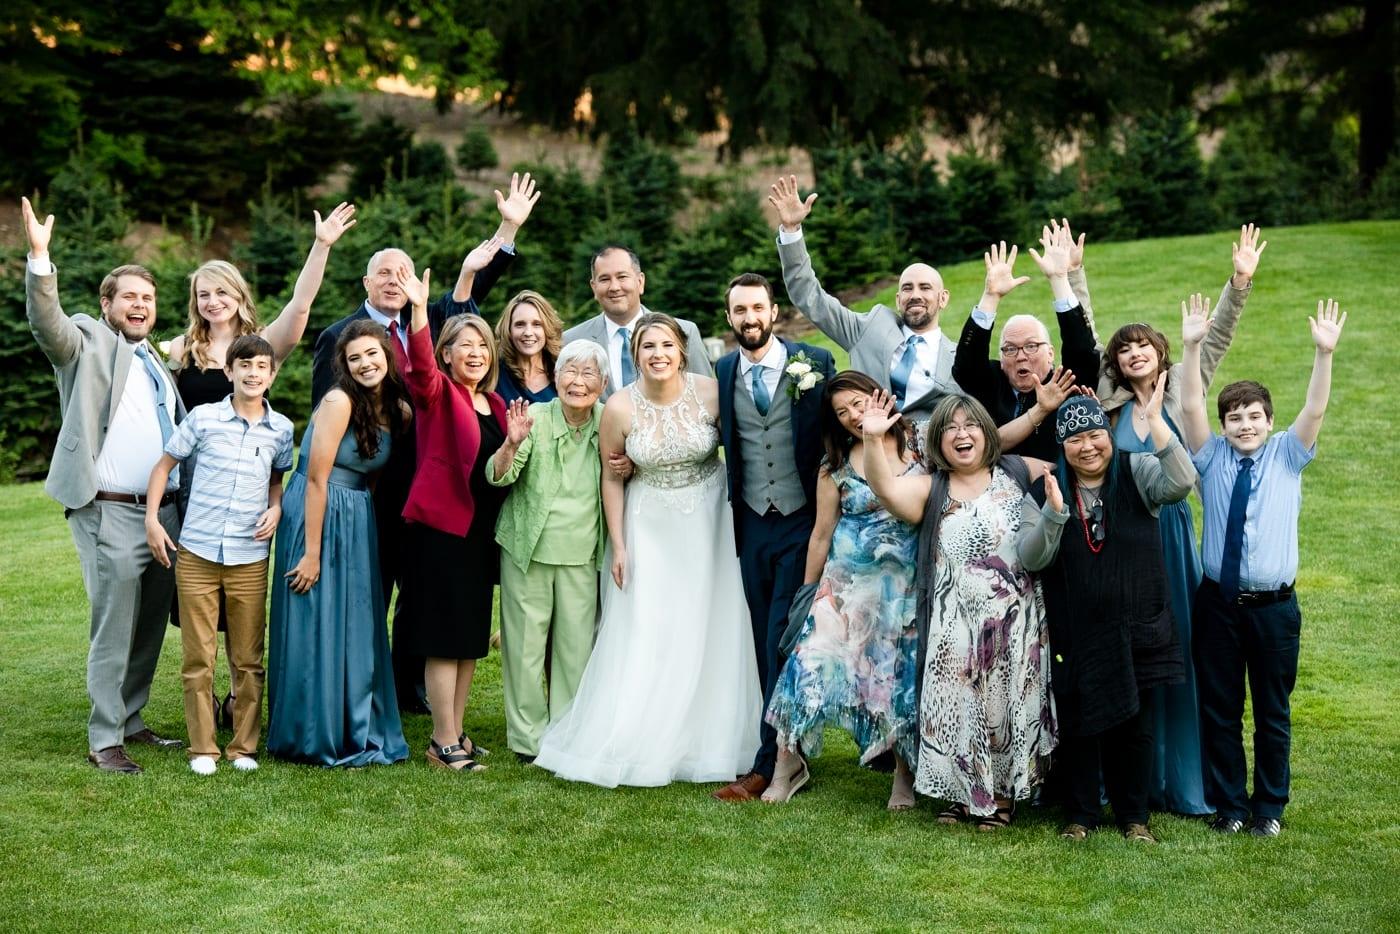 Family-Portrait-Trinity-Tree-Farm-Wedding-Photos-Greener-Visuals